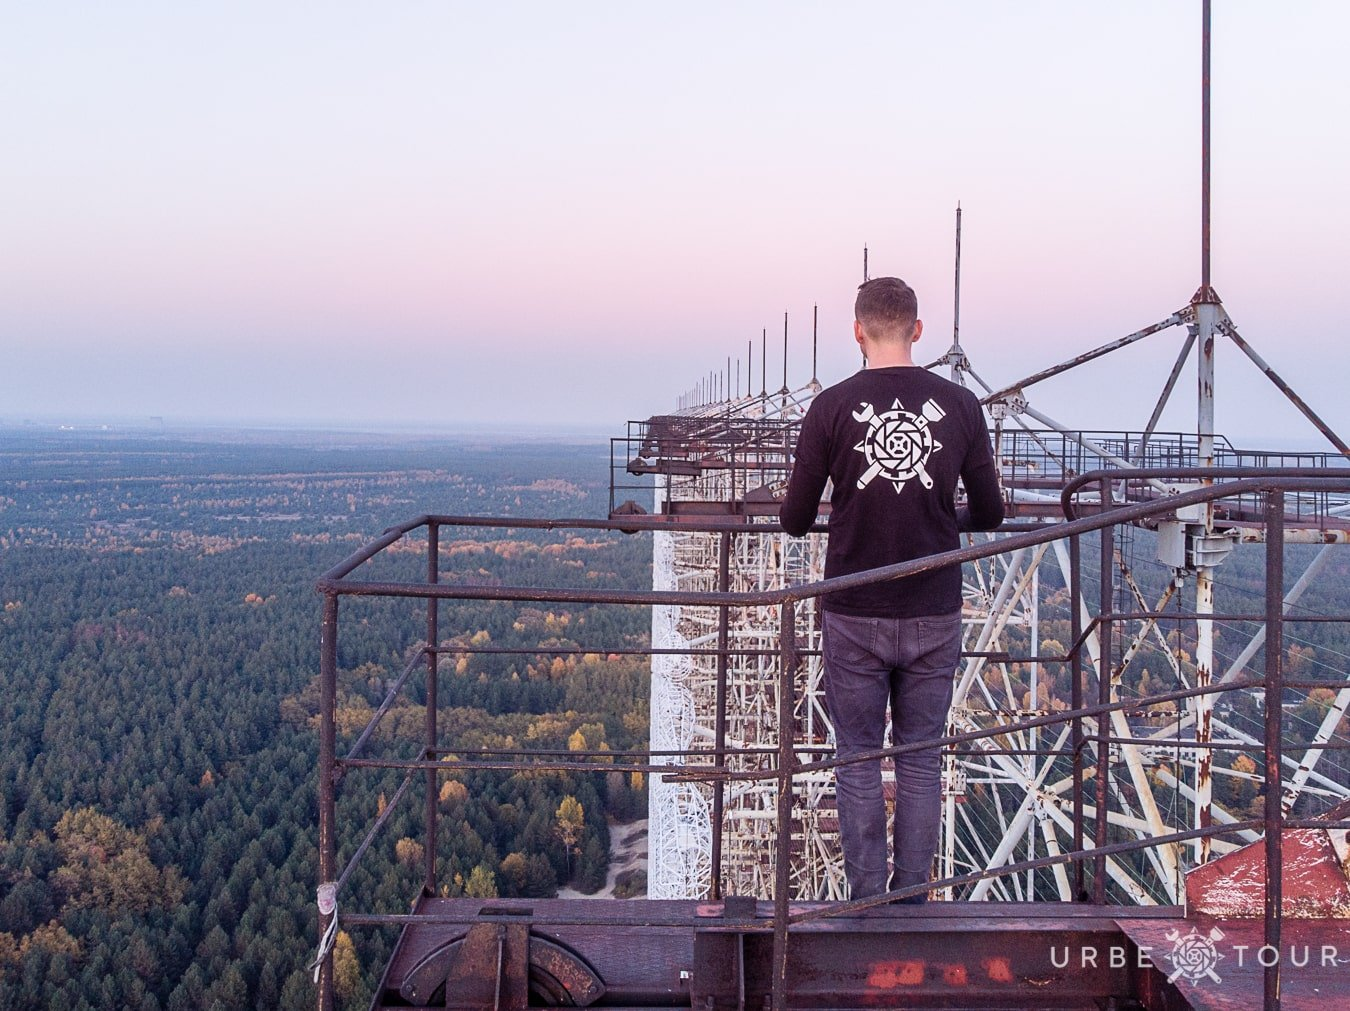 urbextour on the top of radar stationduga-3